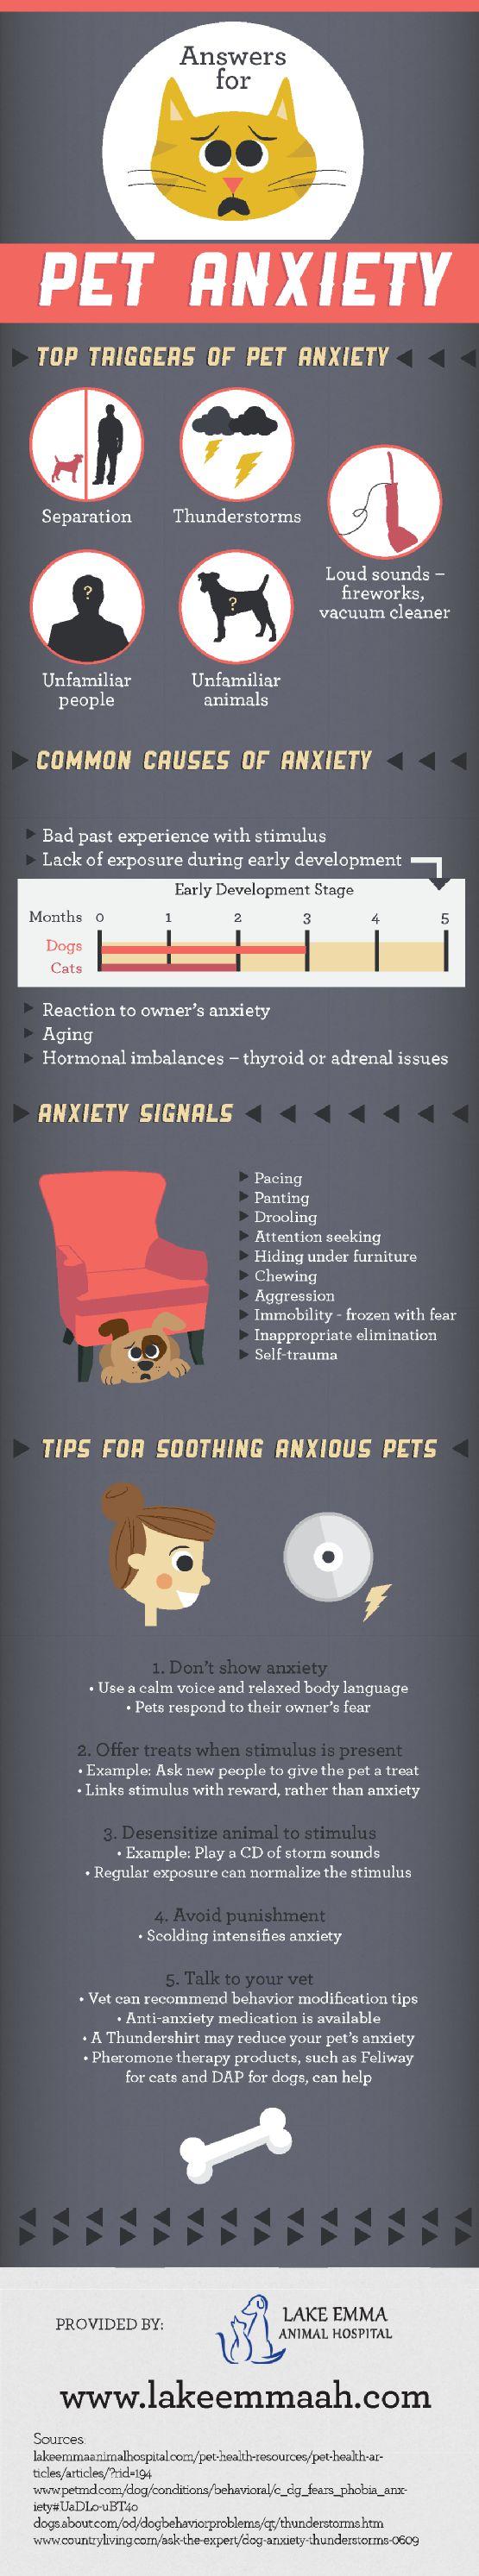 Pet Anxiety